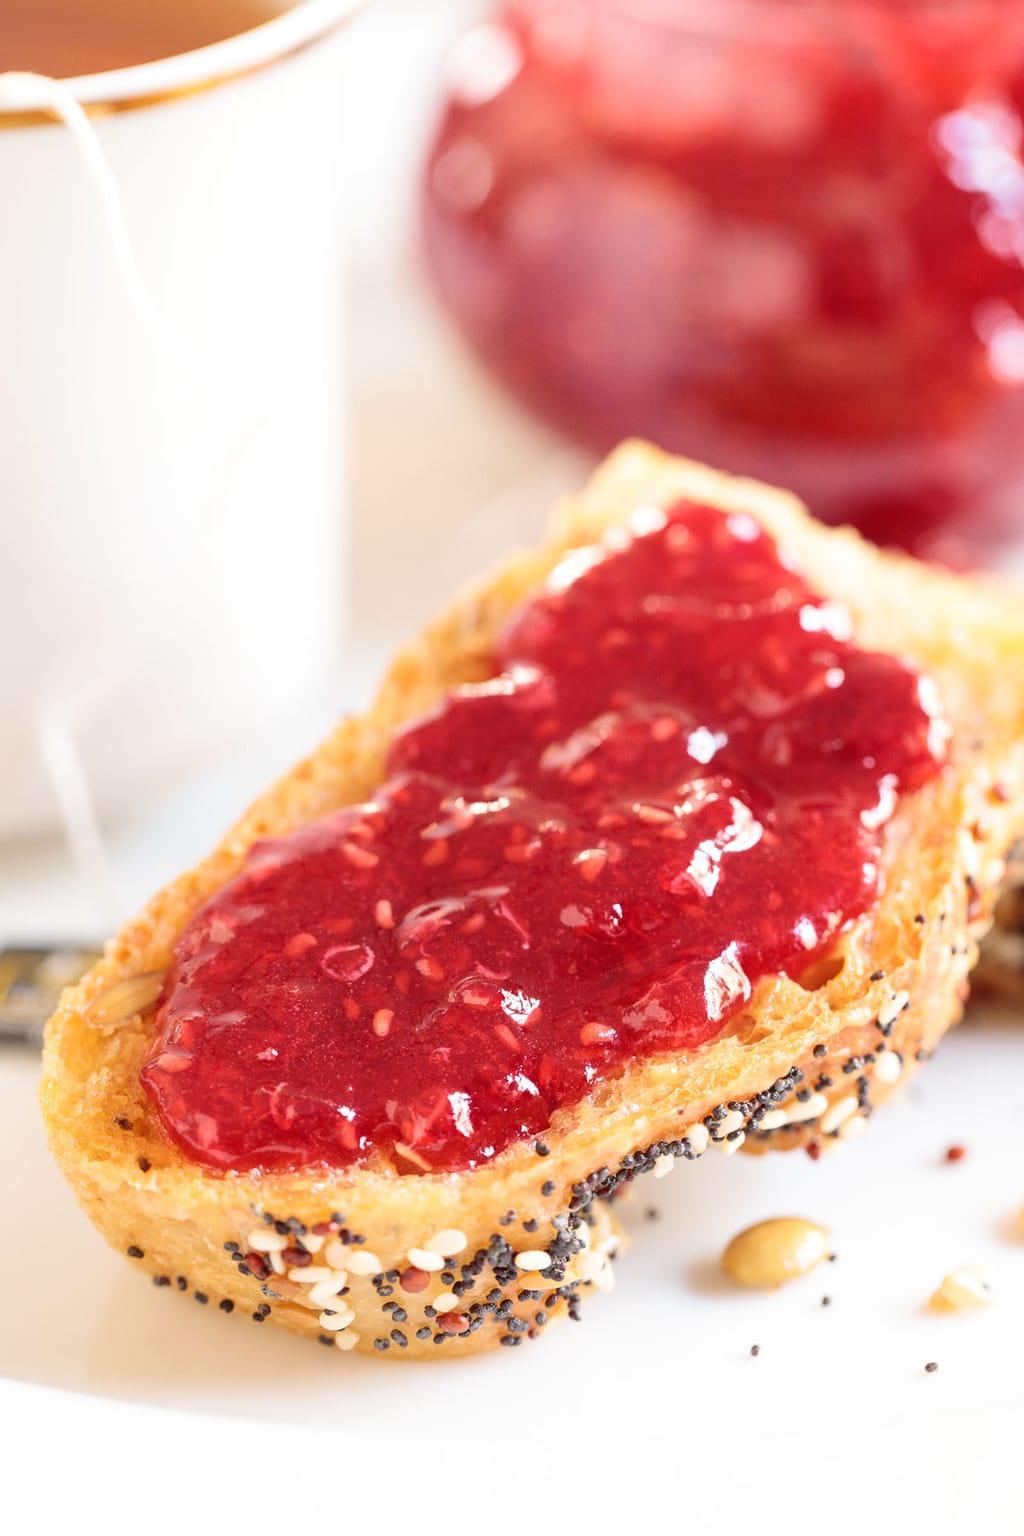 Vertical closeup photo of Easy Raspberry Freezer Jam spread on a slice of toast.